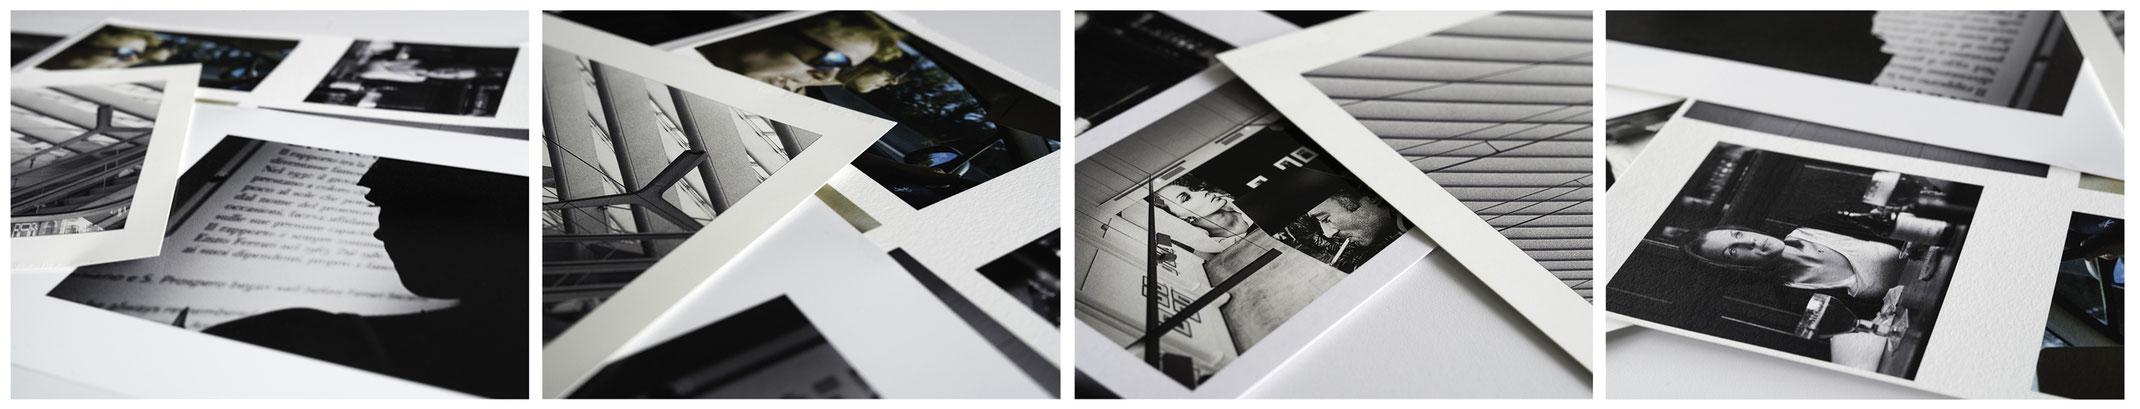 La cadre nomade impression de photos